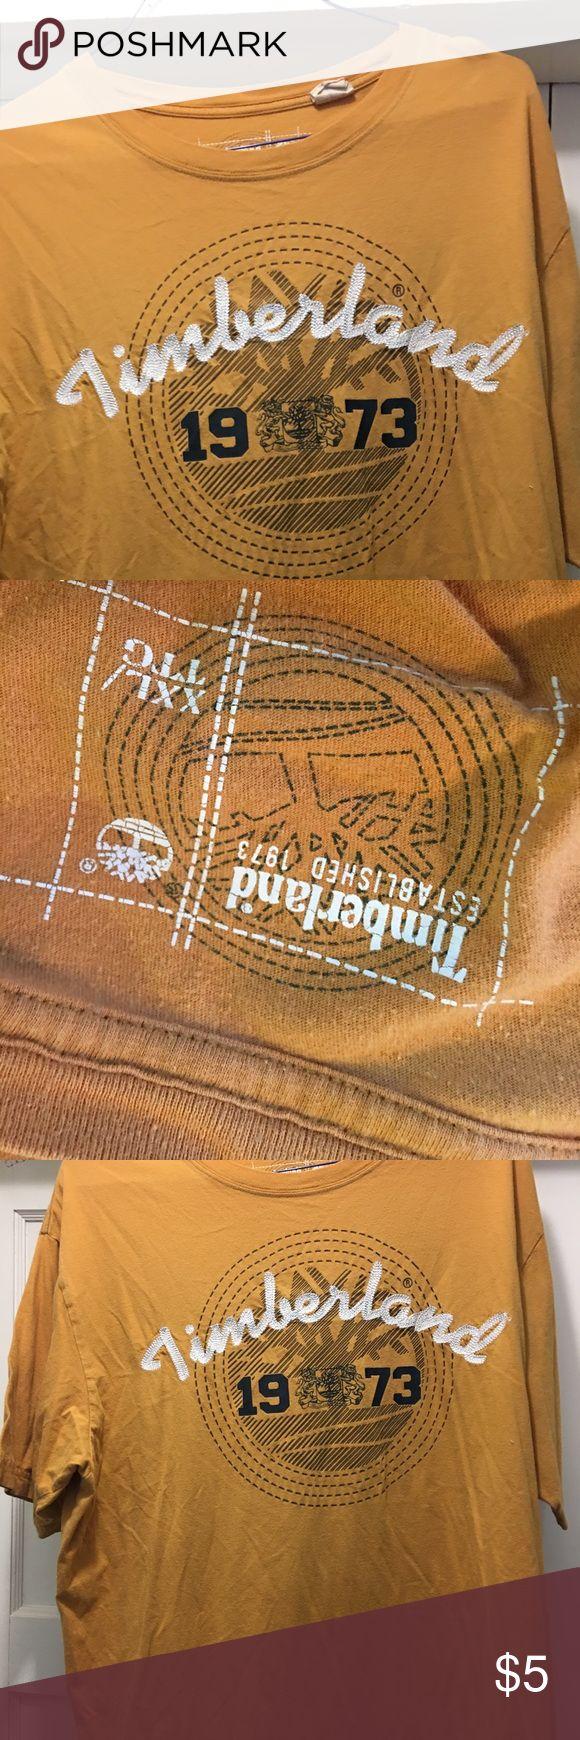 Men's Timberland, XL, T-shirt Men's Timberland, XL, T-shirt, good condition; smoke-free home. Timberland Shirts Tees - Short Sleeve